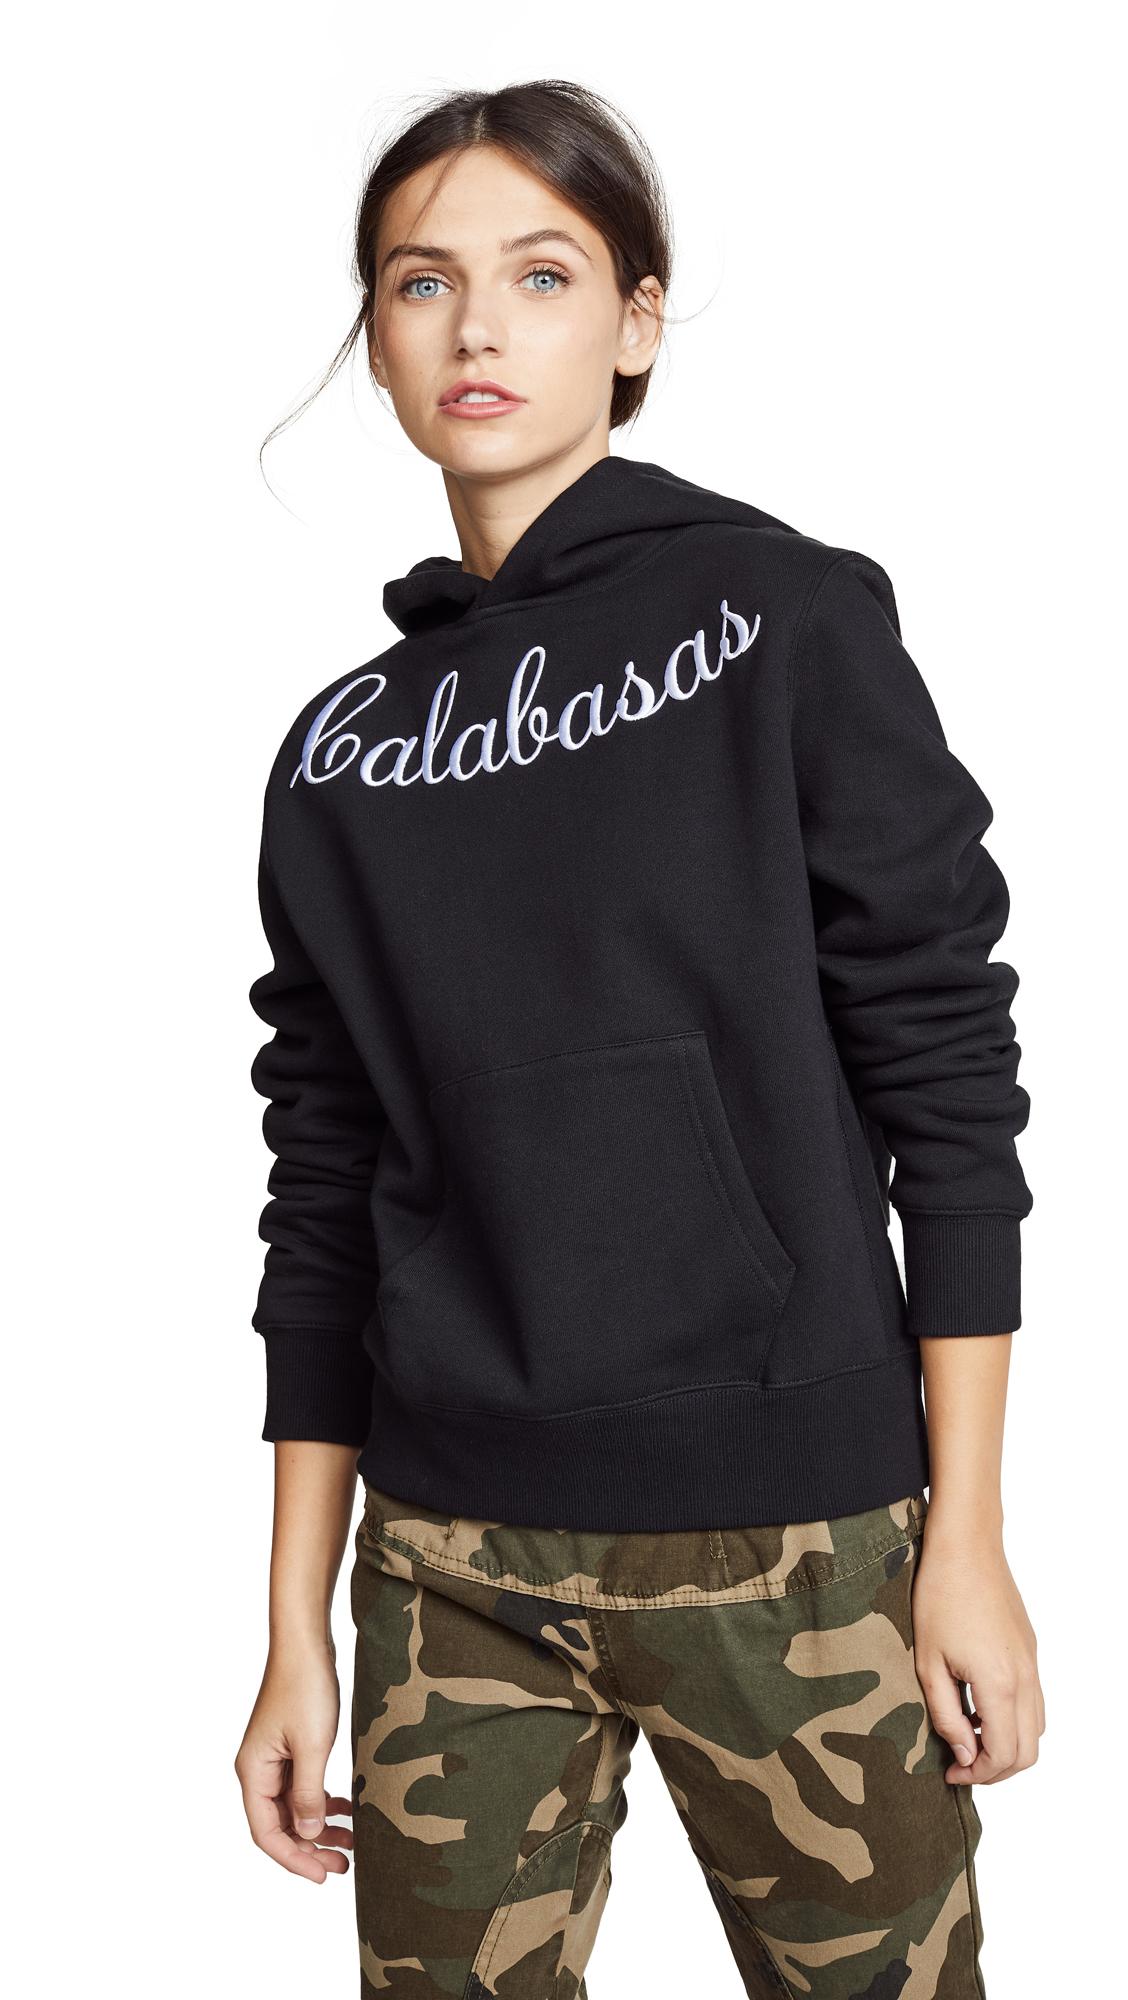 KENDALL + KYLIE Embroidered Oversize Fleece Sweatshirt In Calabasas Black